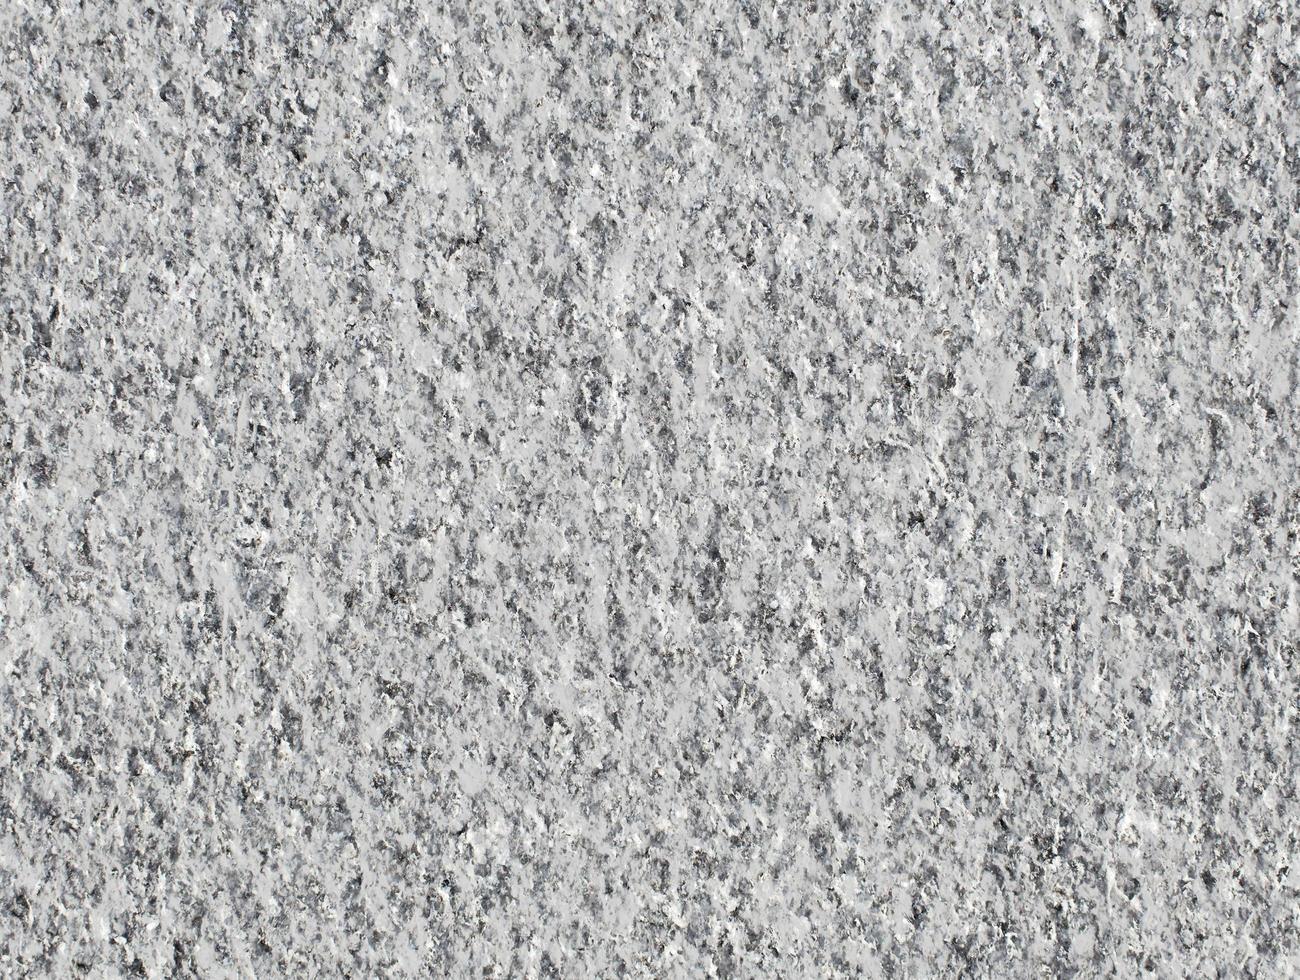 texture de mur de granit photo